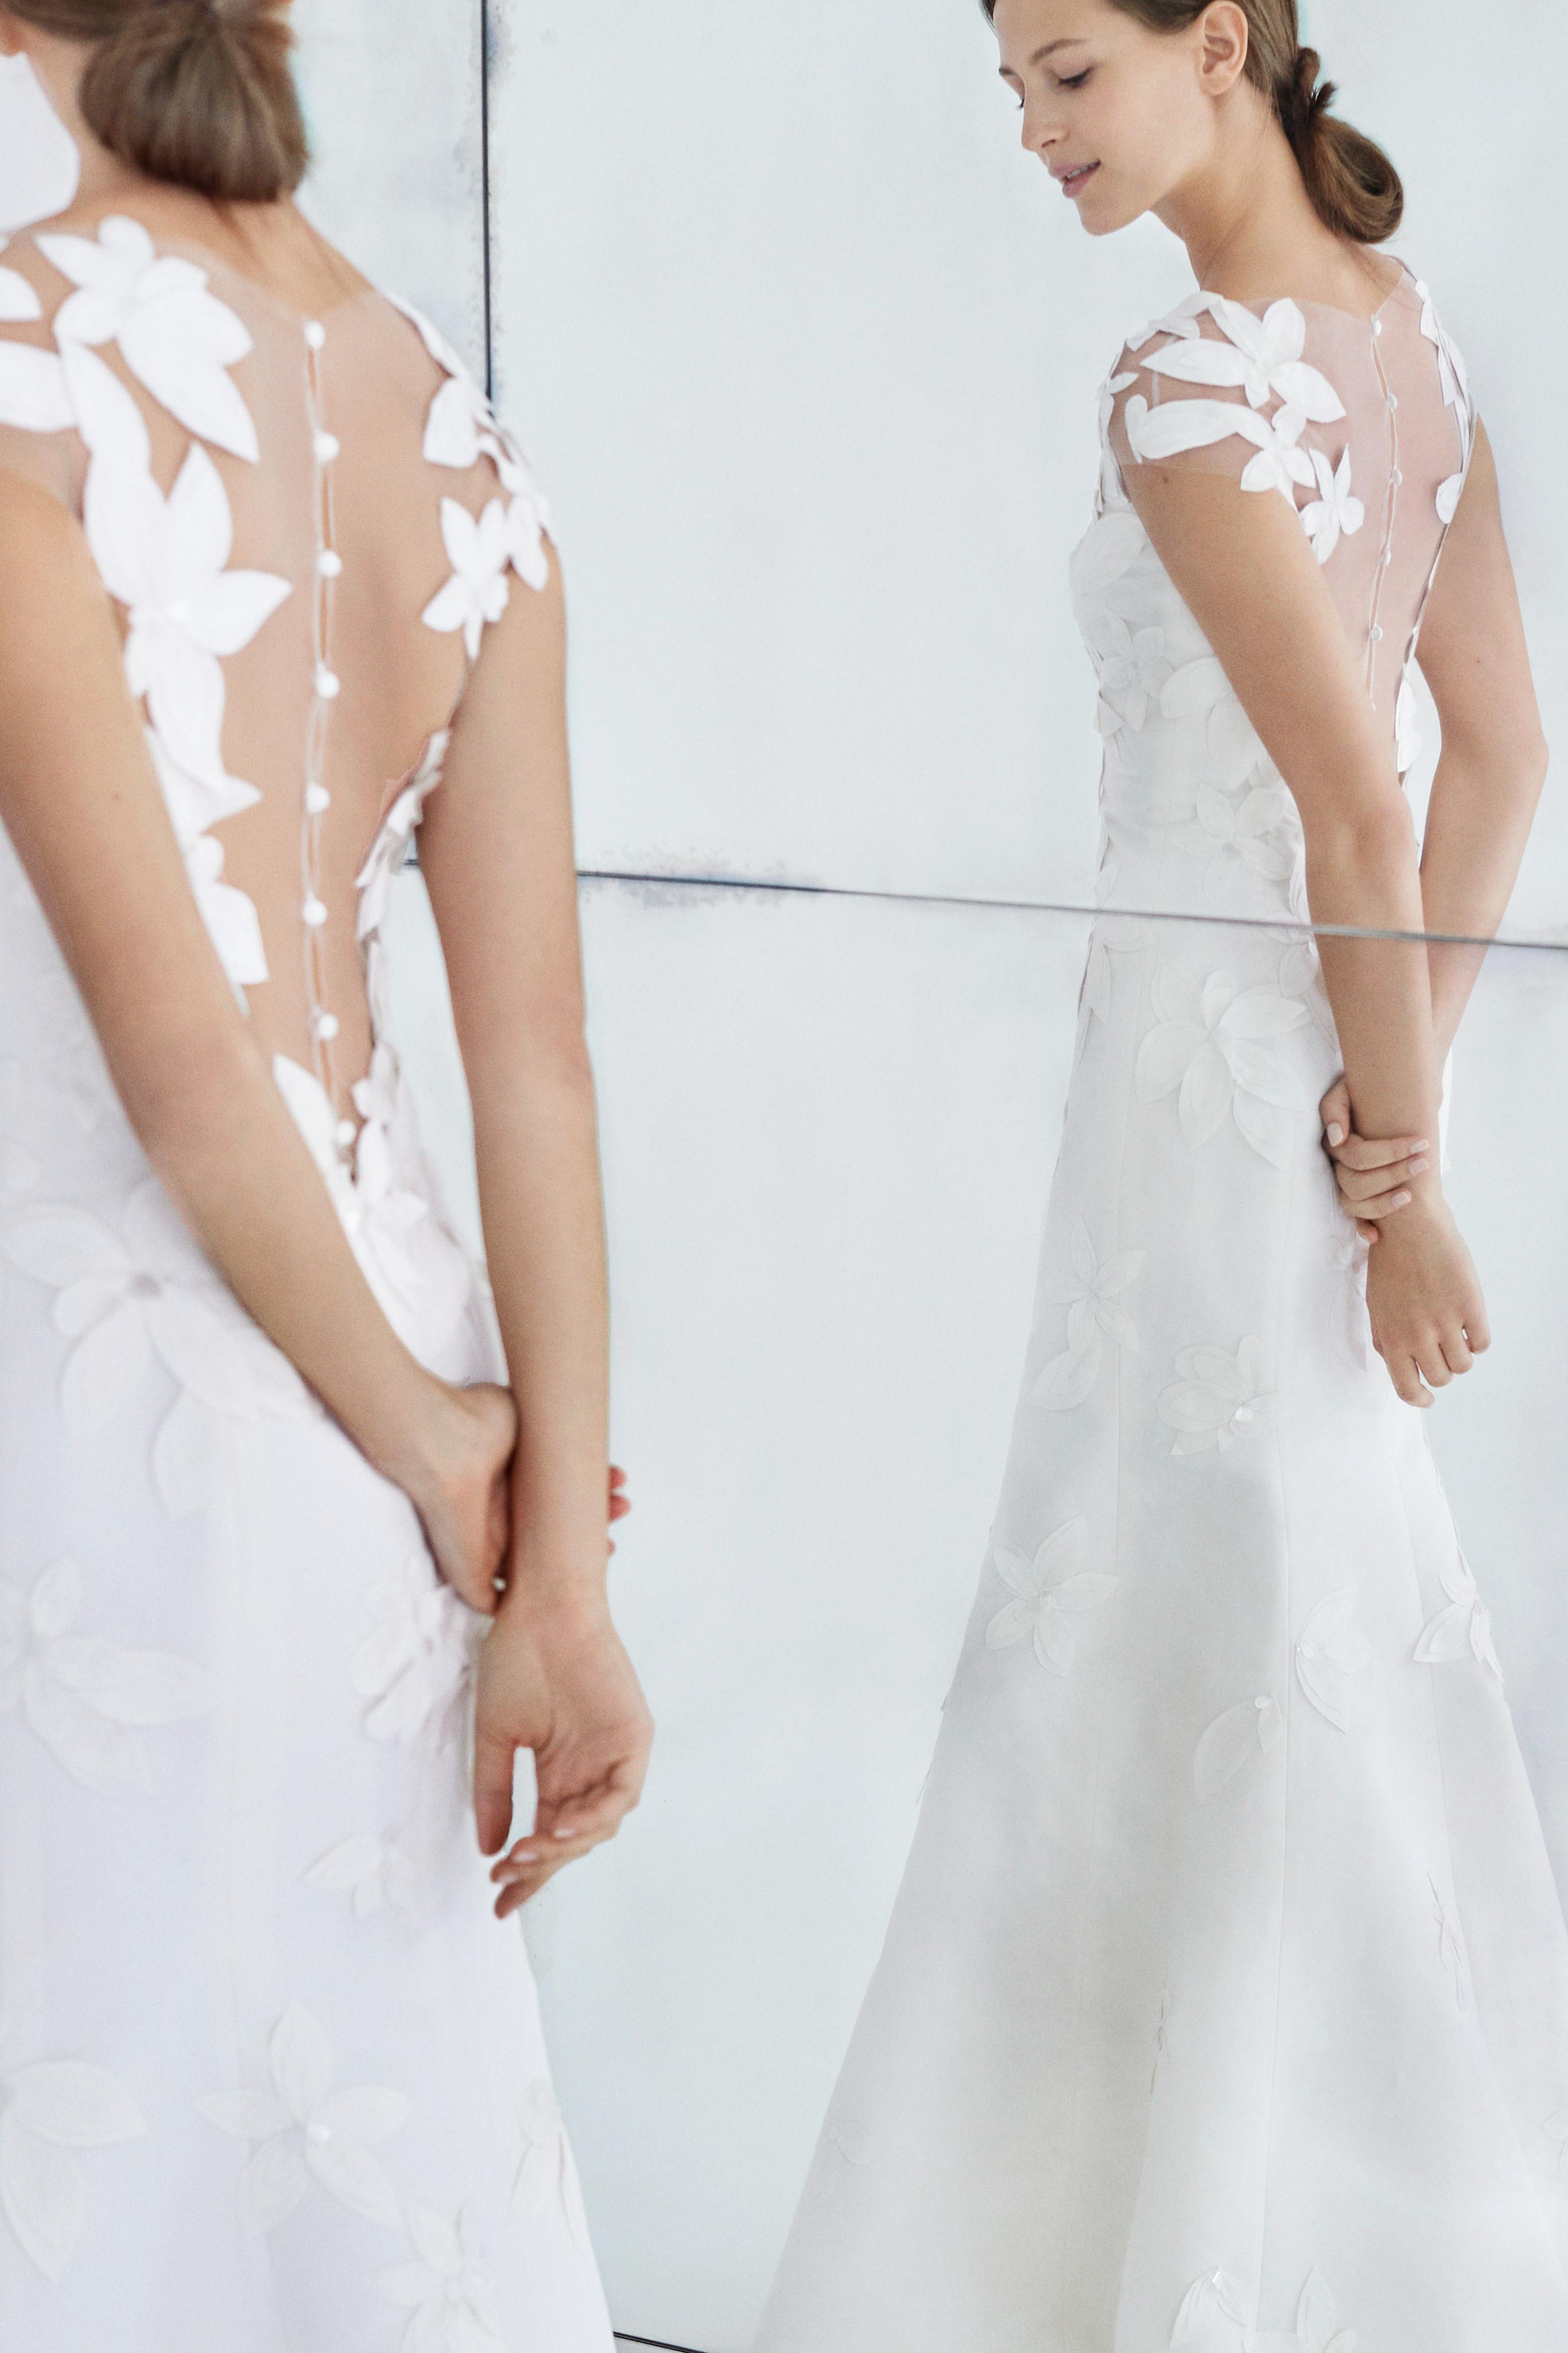 carolina herrera wedding dress fall 2018 floral high neck sheath